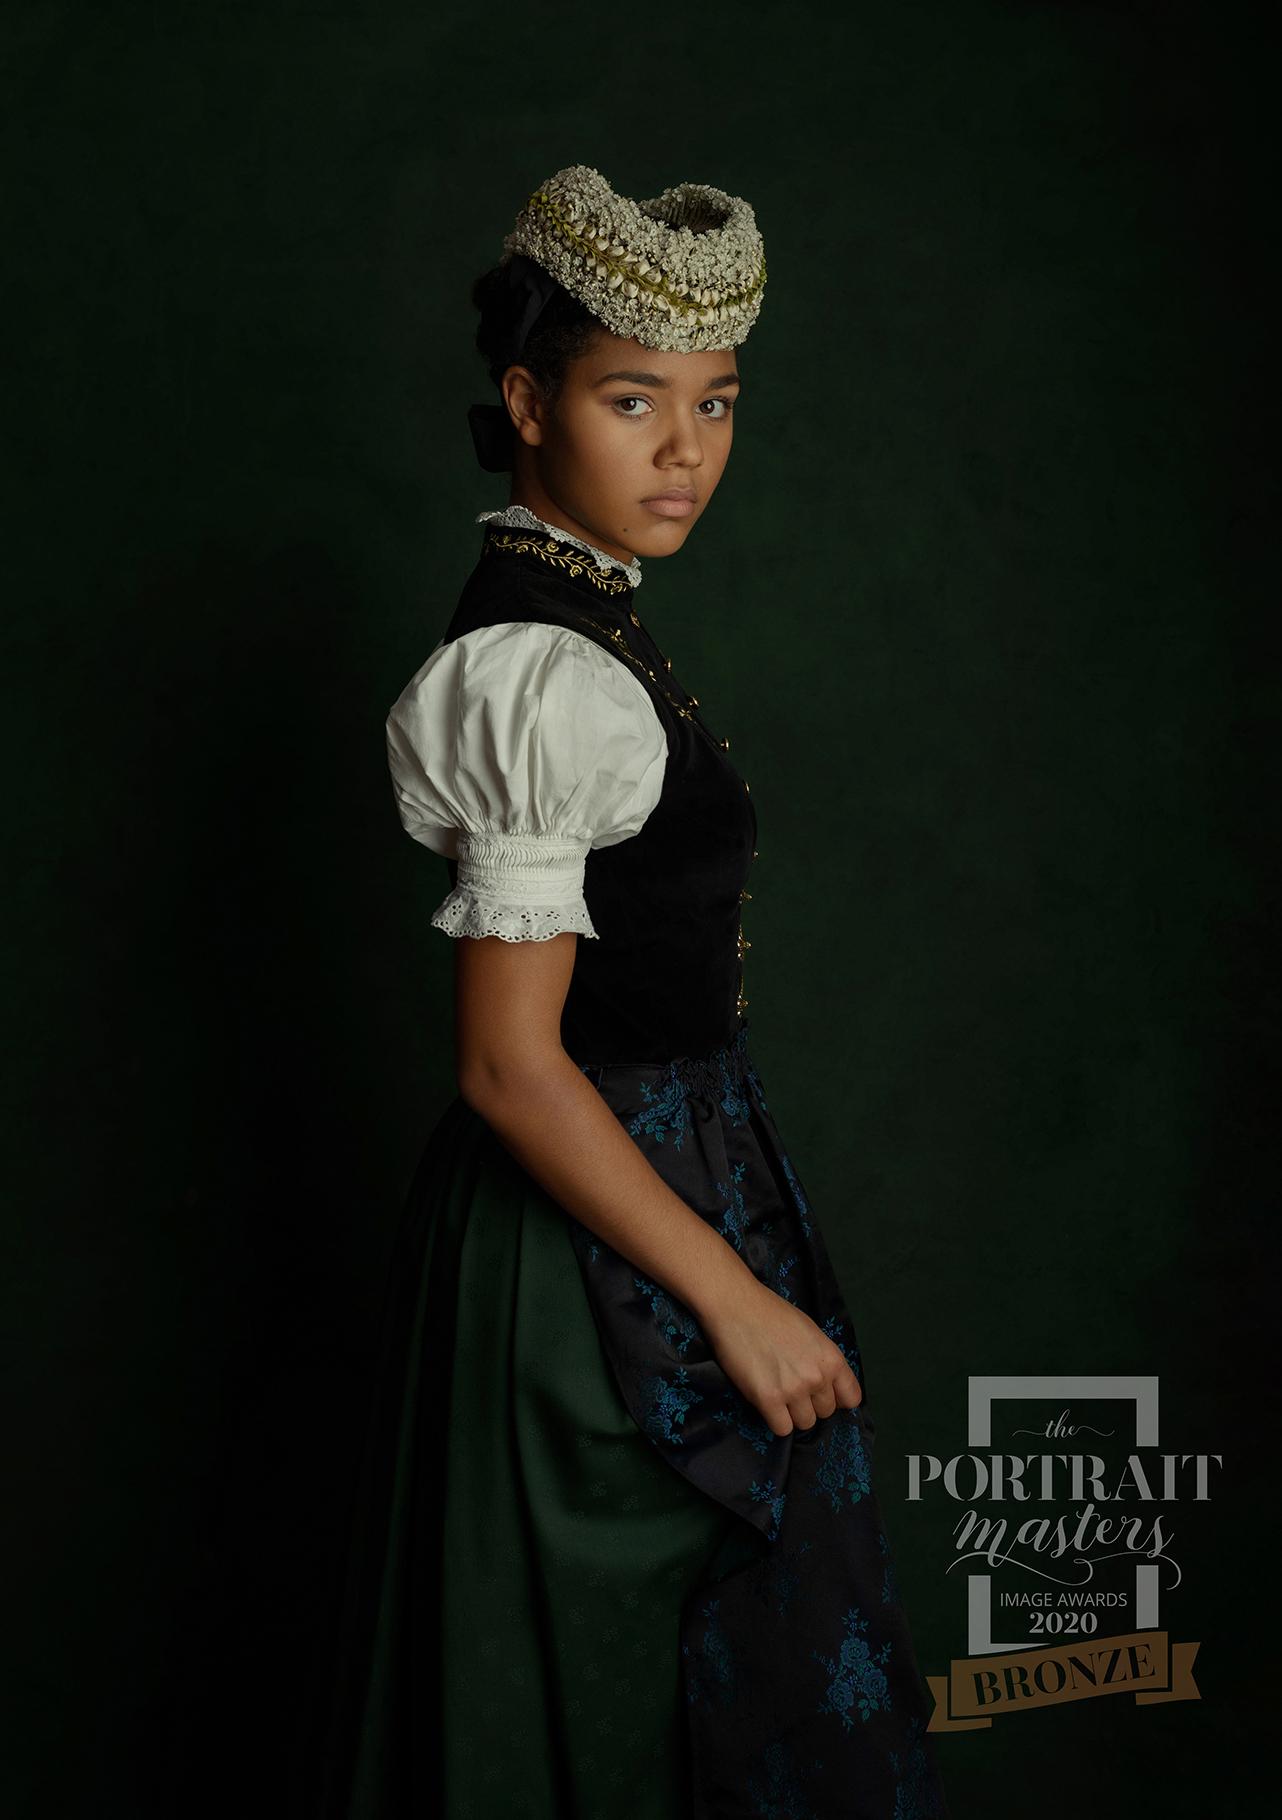 Portrait Masters 2020 Bronze Award